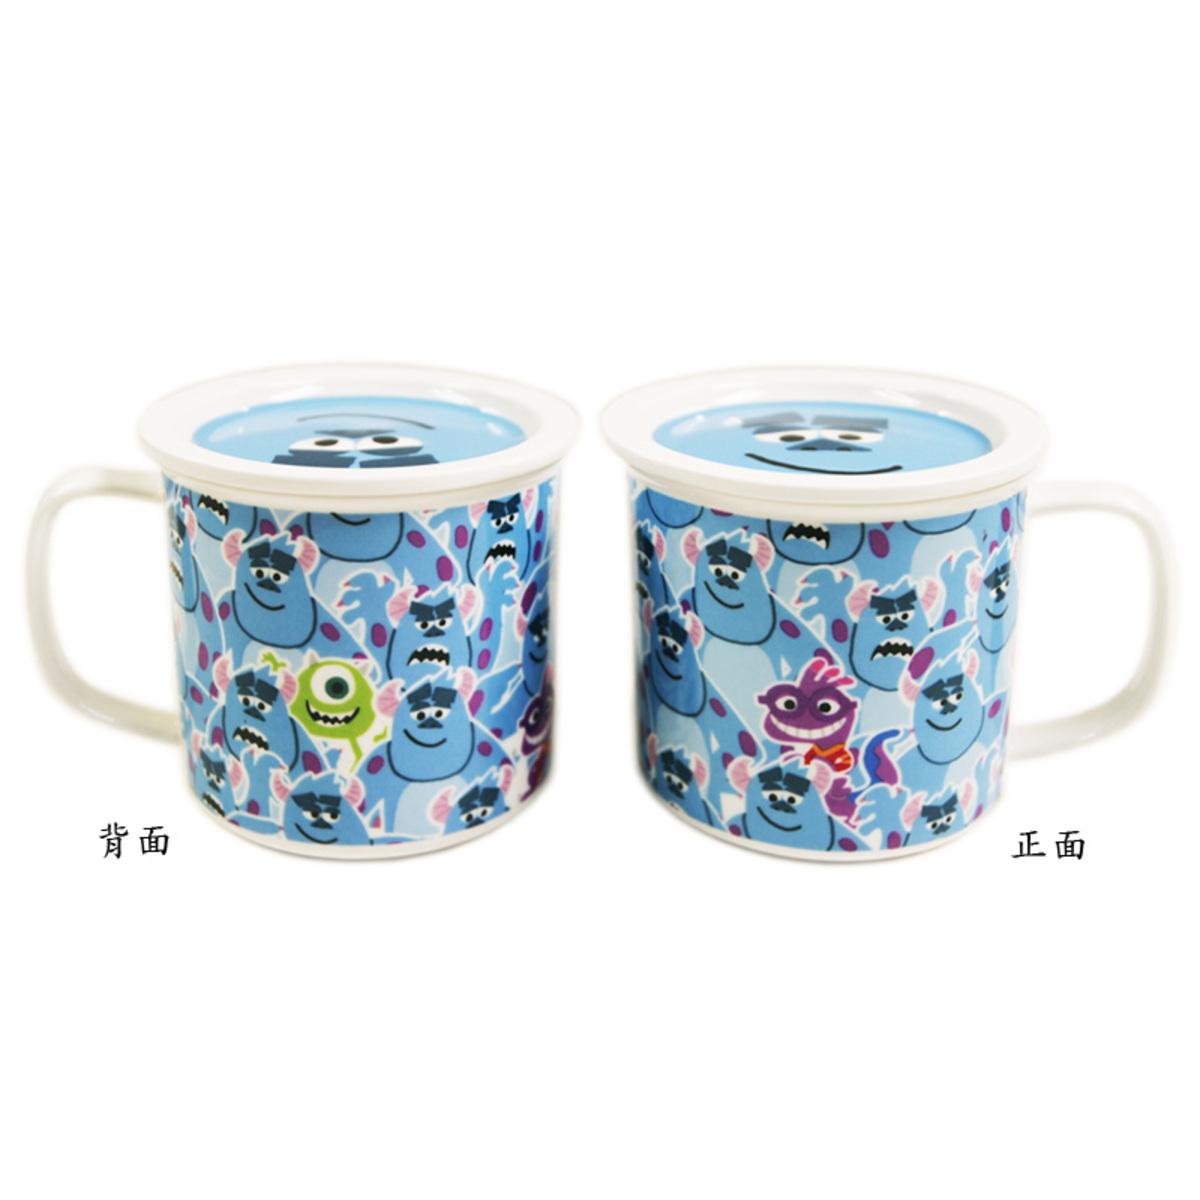 Ceramic Mug with Lid (Licensed by Disney)